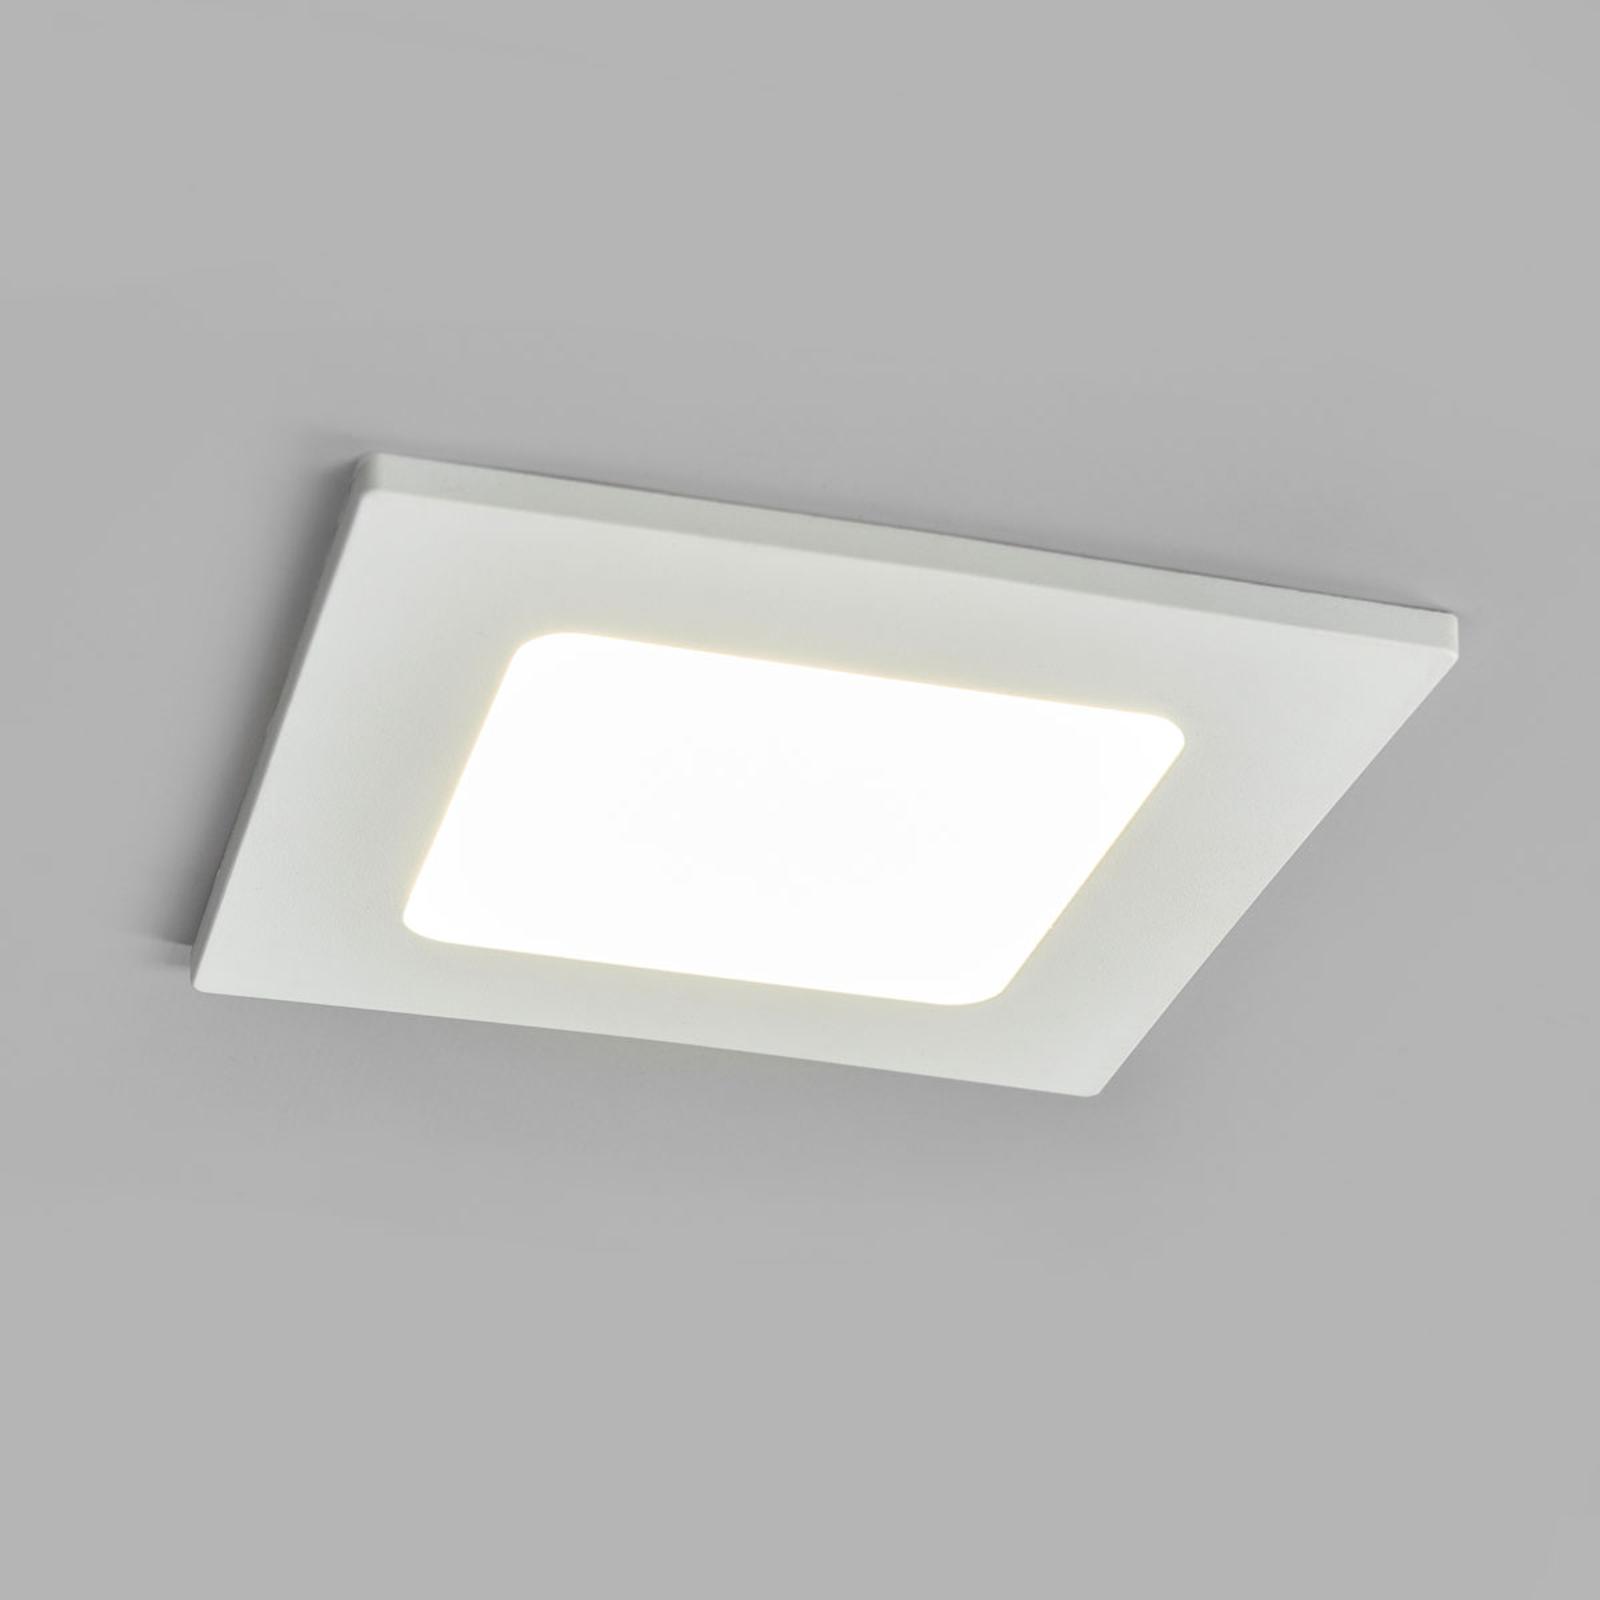 LED-indbygningsspot Joki hvid 4000K kantet 11,5cm